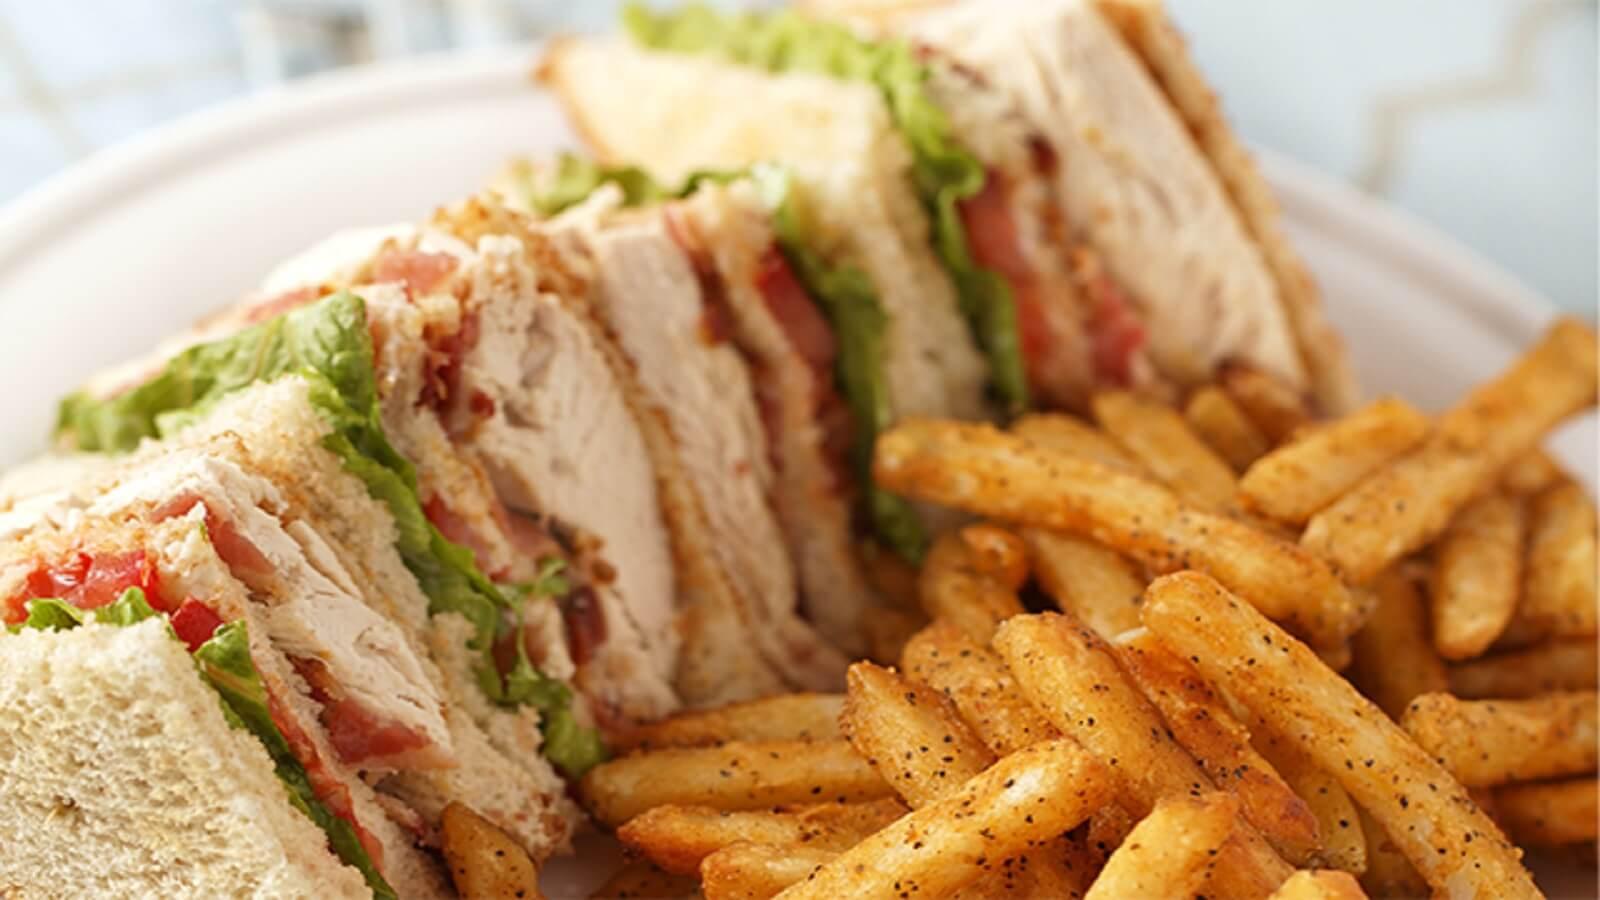 Jacq's Sandwich Bar